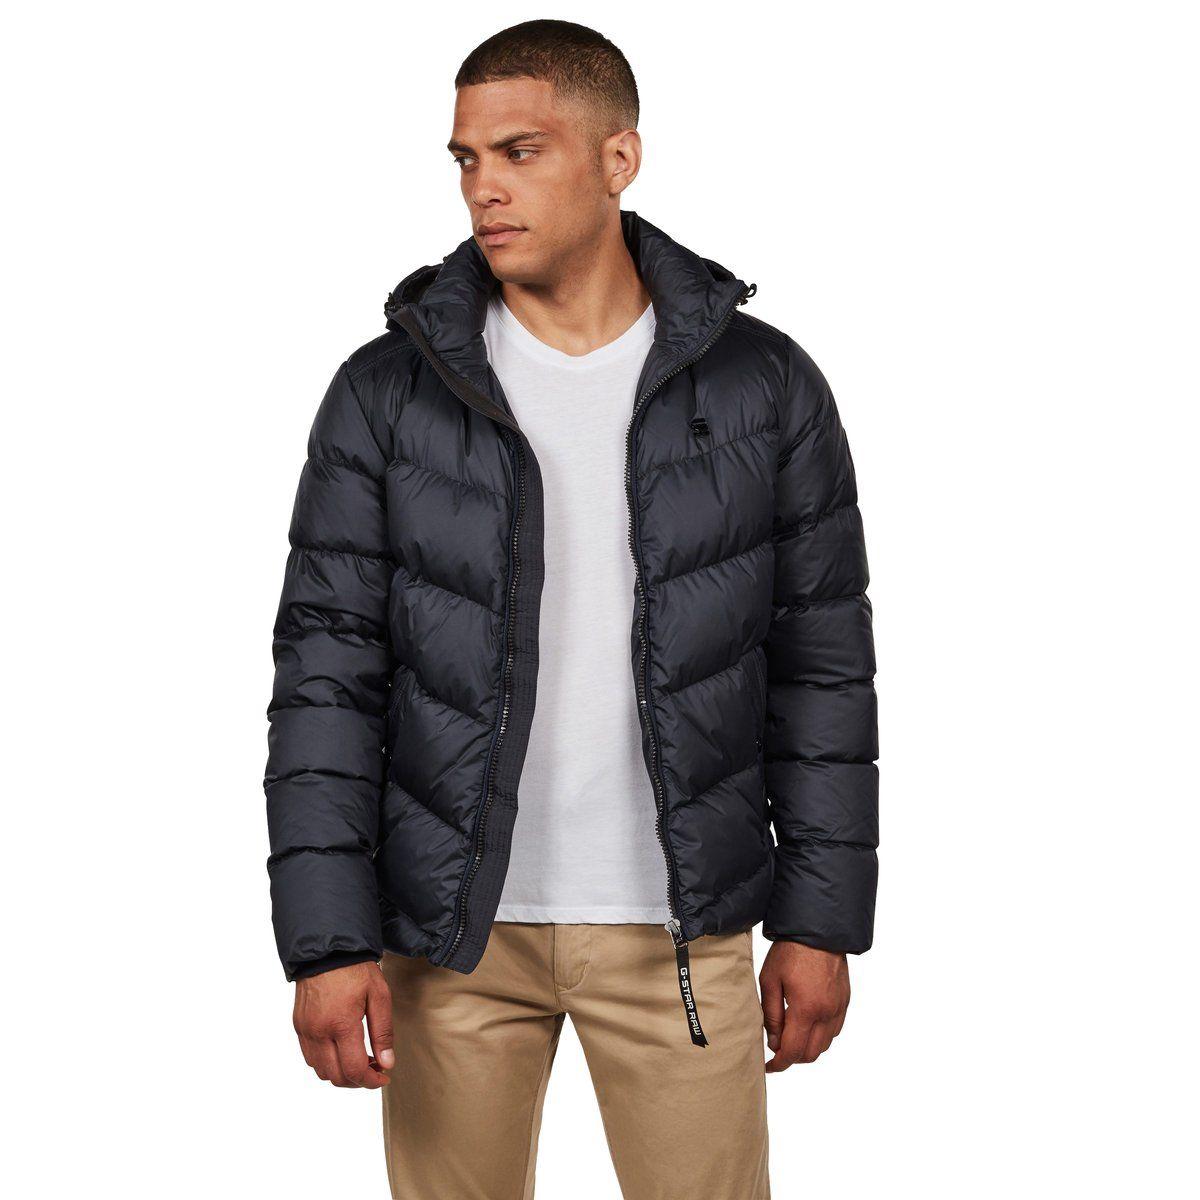 Men S Whistler Down Puffer Jacket Winter Jackets G Star Raw G Star [ 1200 x 1200 Pixel ]